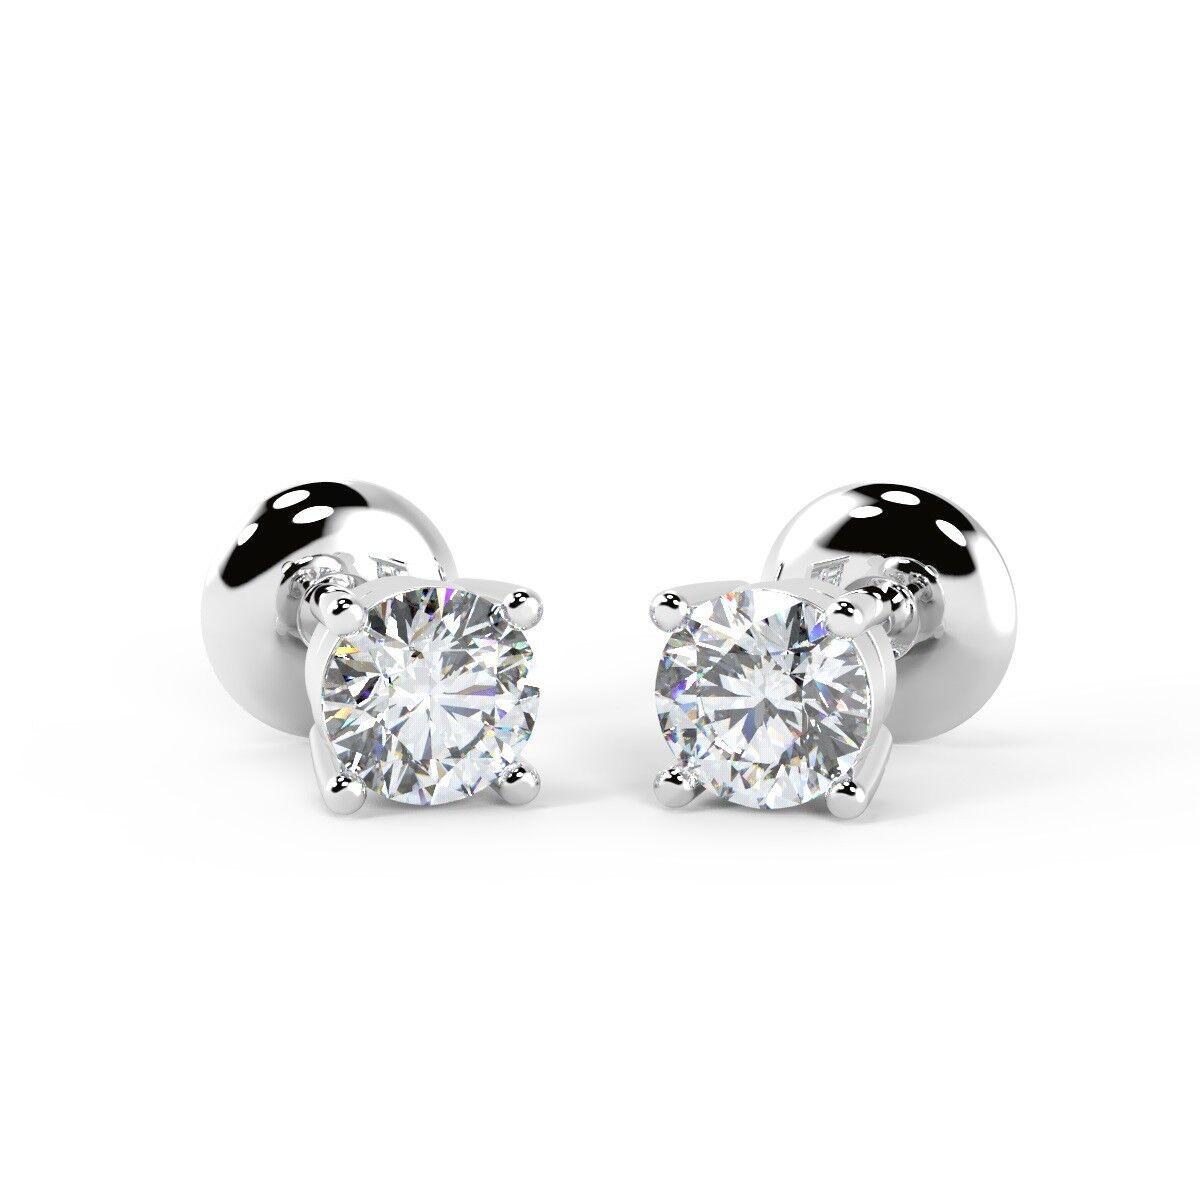 0 25 Ct Round Diamond Stud Earrings Uk Hallmarked White Gold